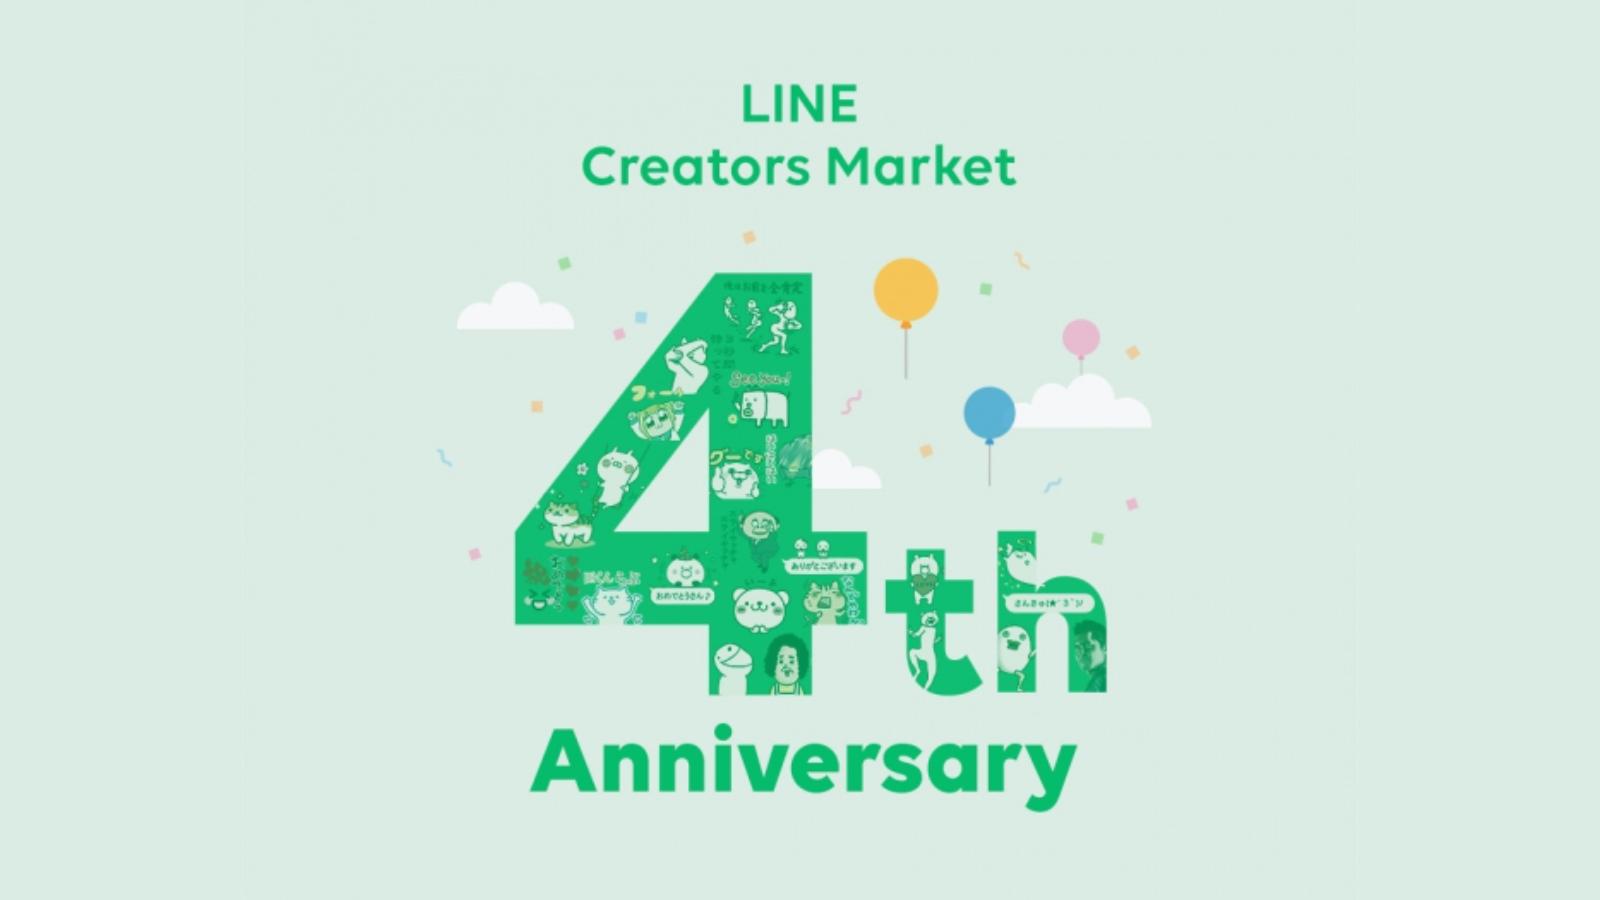 Line-Creators-Market-4th-anniversary.jpg